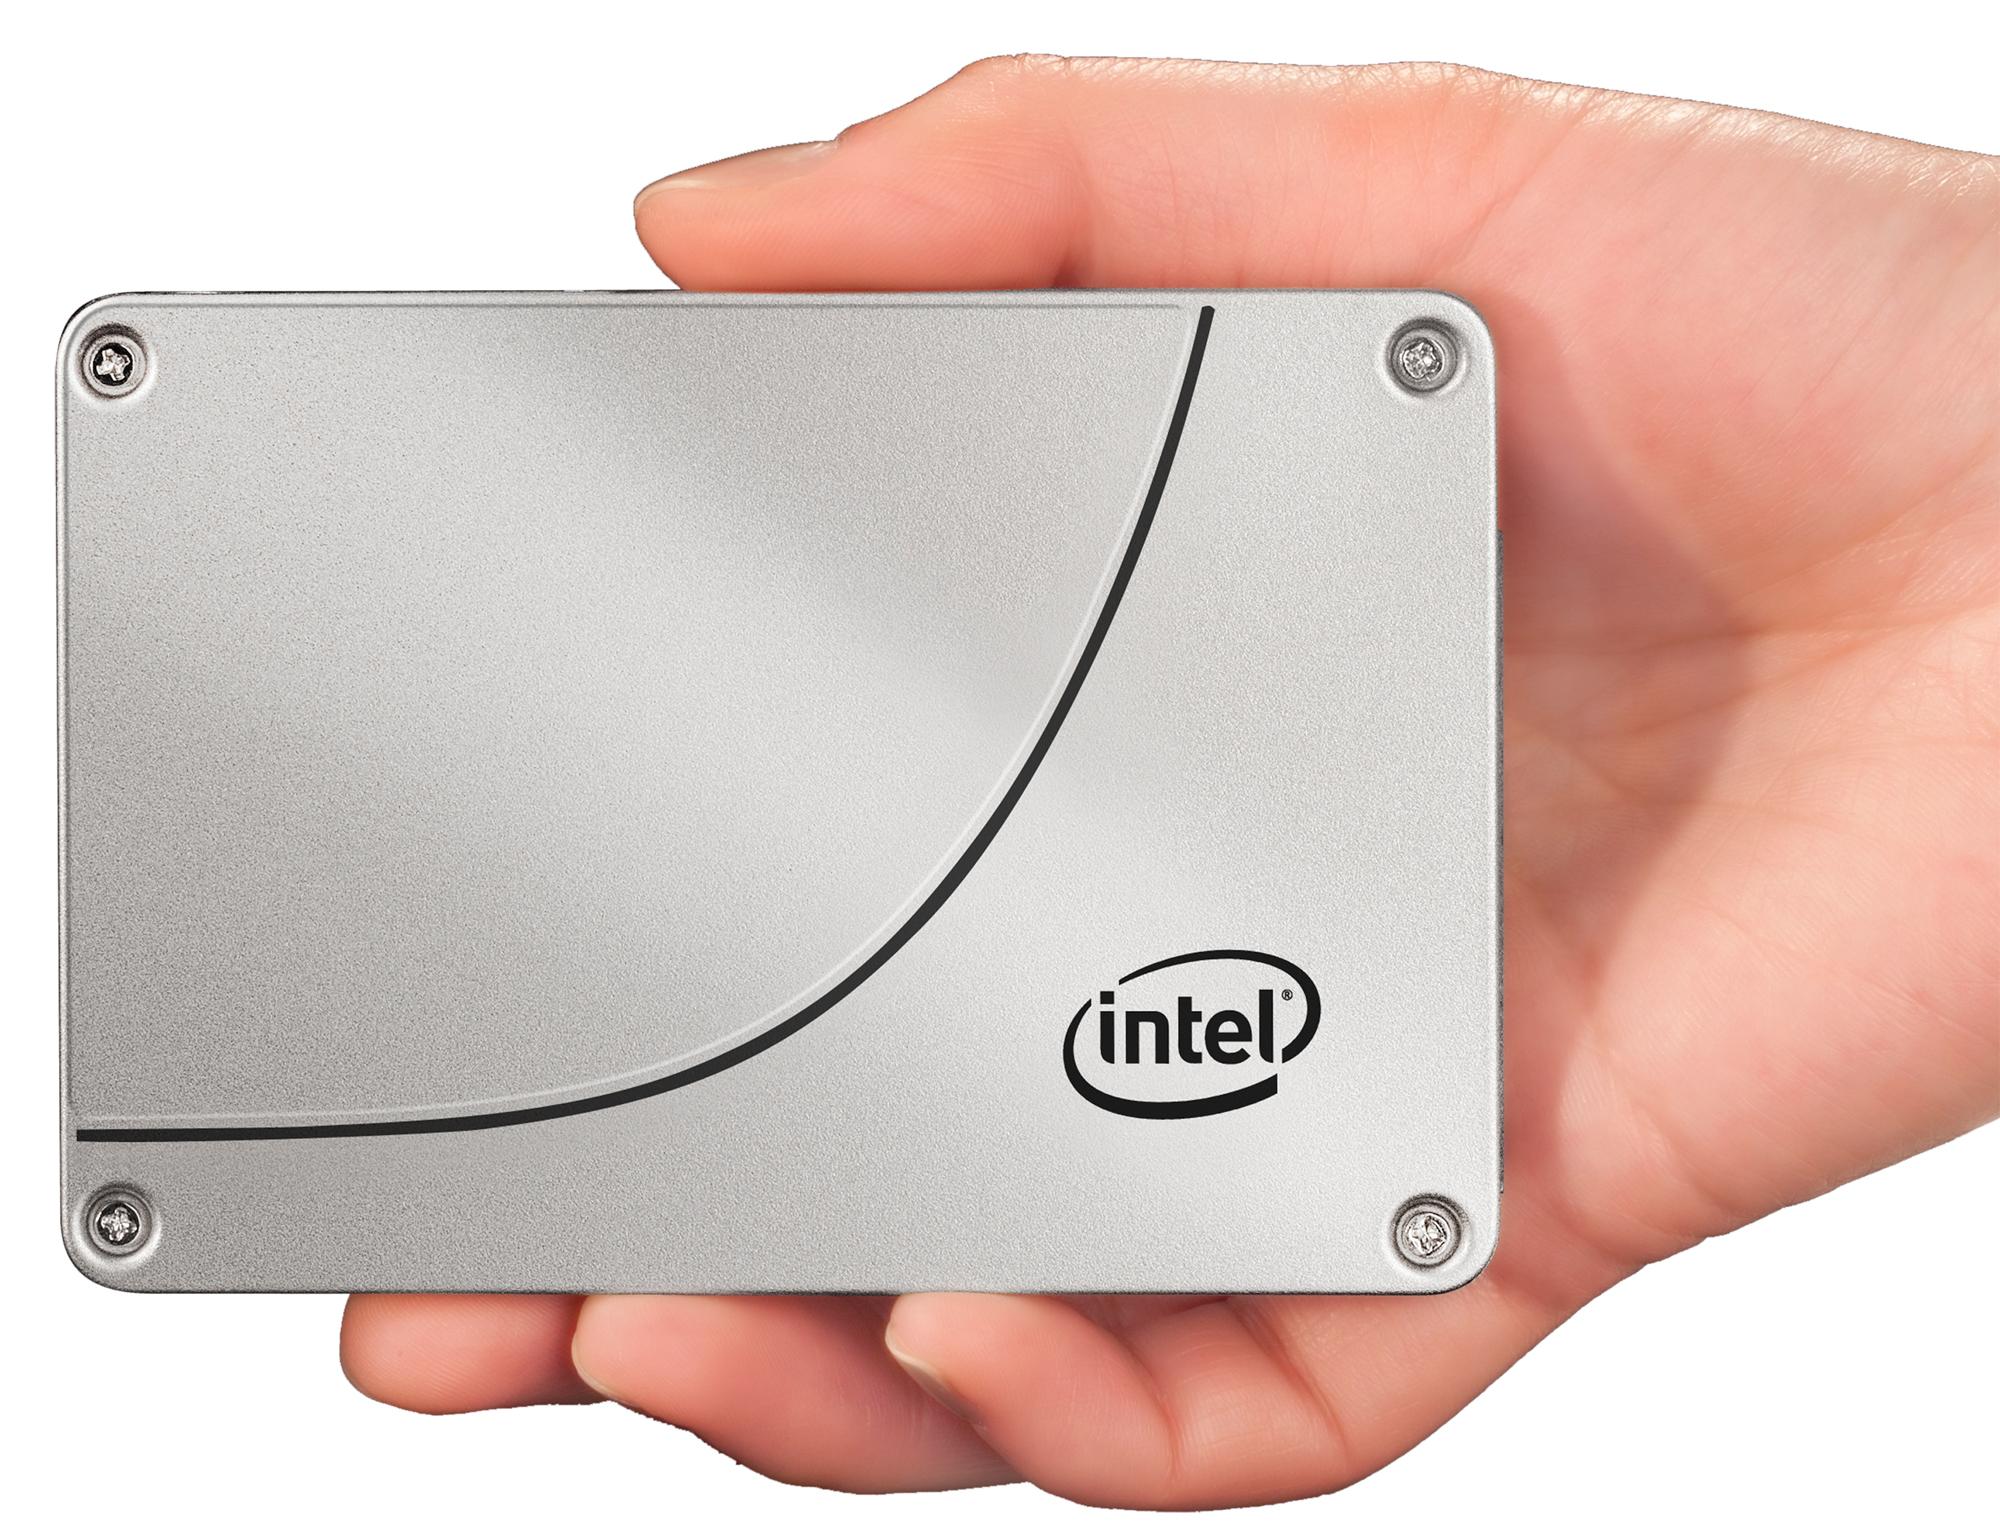 Intel-SSD-DC-S3700_Handshake.jpg